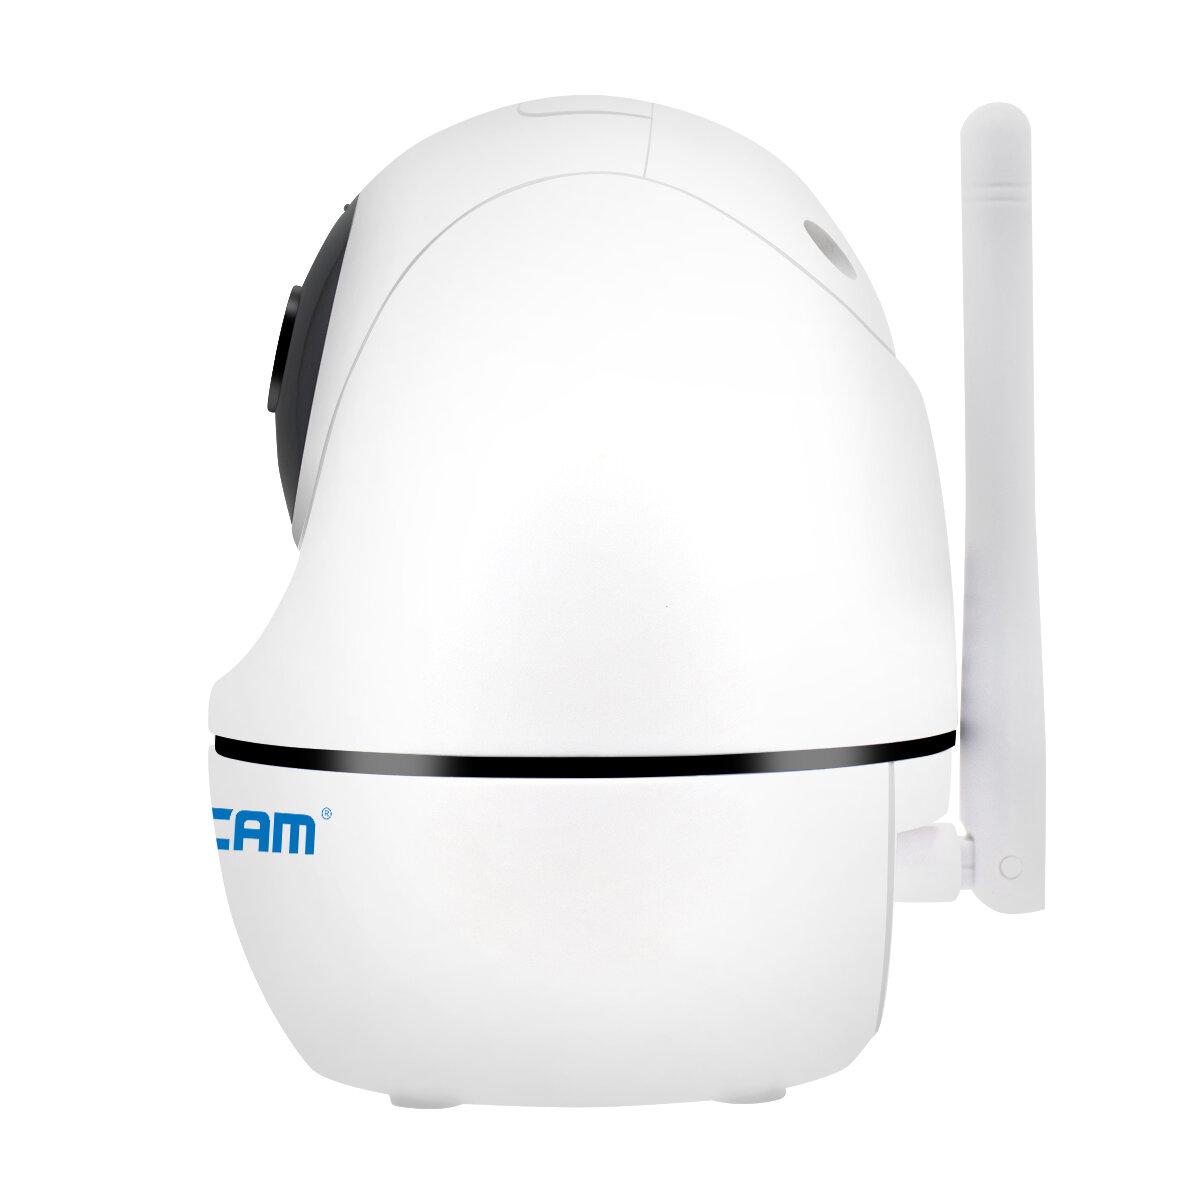 ESCAMPVR008H.265AutoTrackingPTZ Pan / Tile Camera 2MP HD 1080P Draadloze nachtzicht IP camera - 4